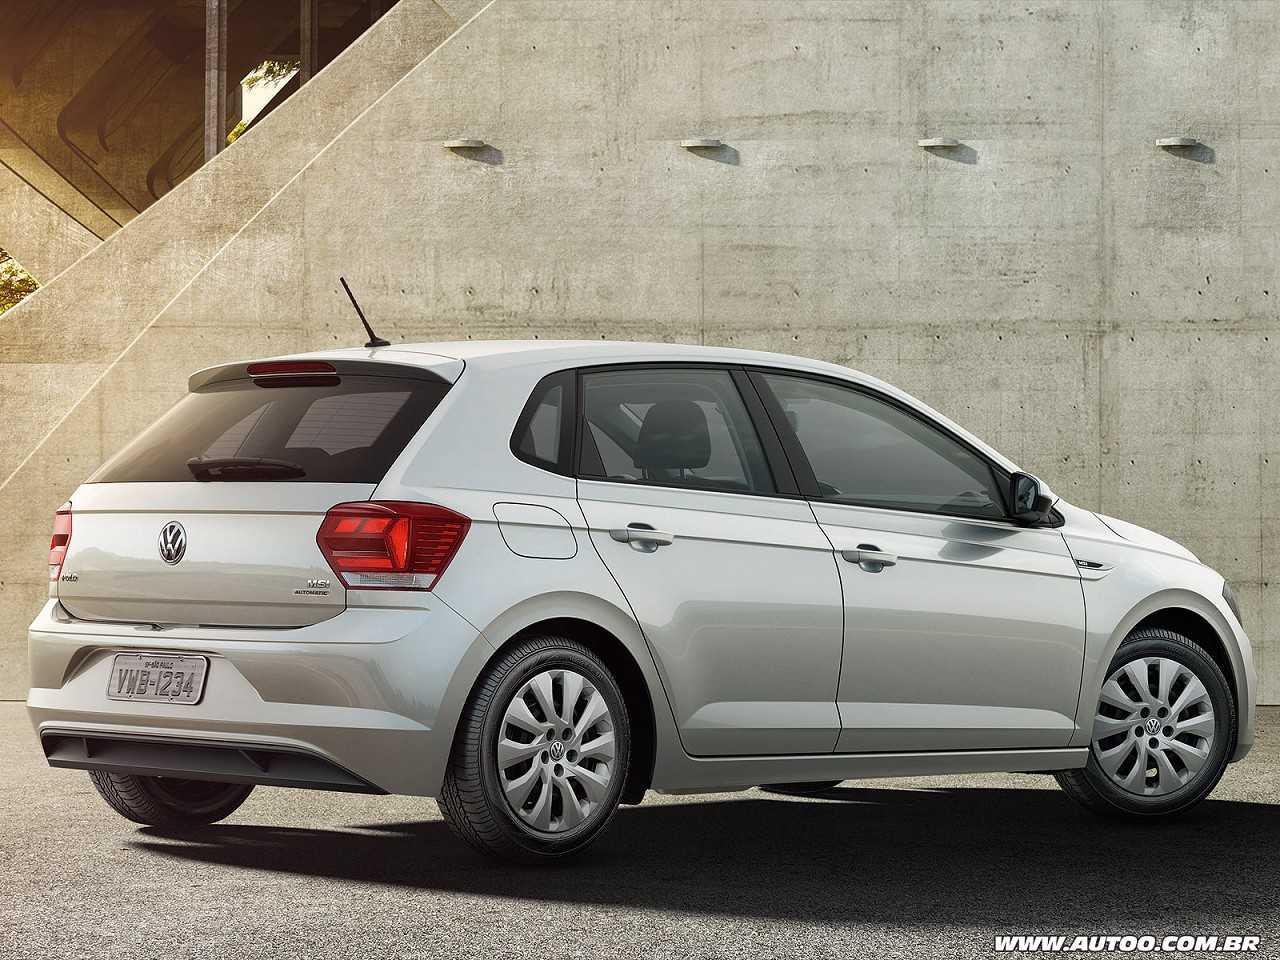 VolkswagenPolo 2019 - ângulo traseiro